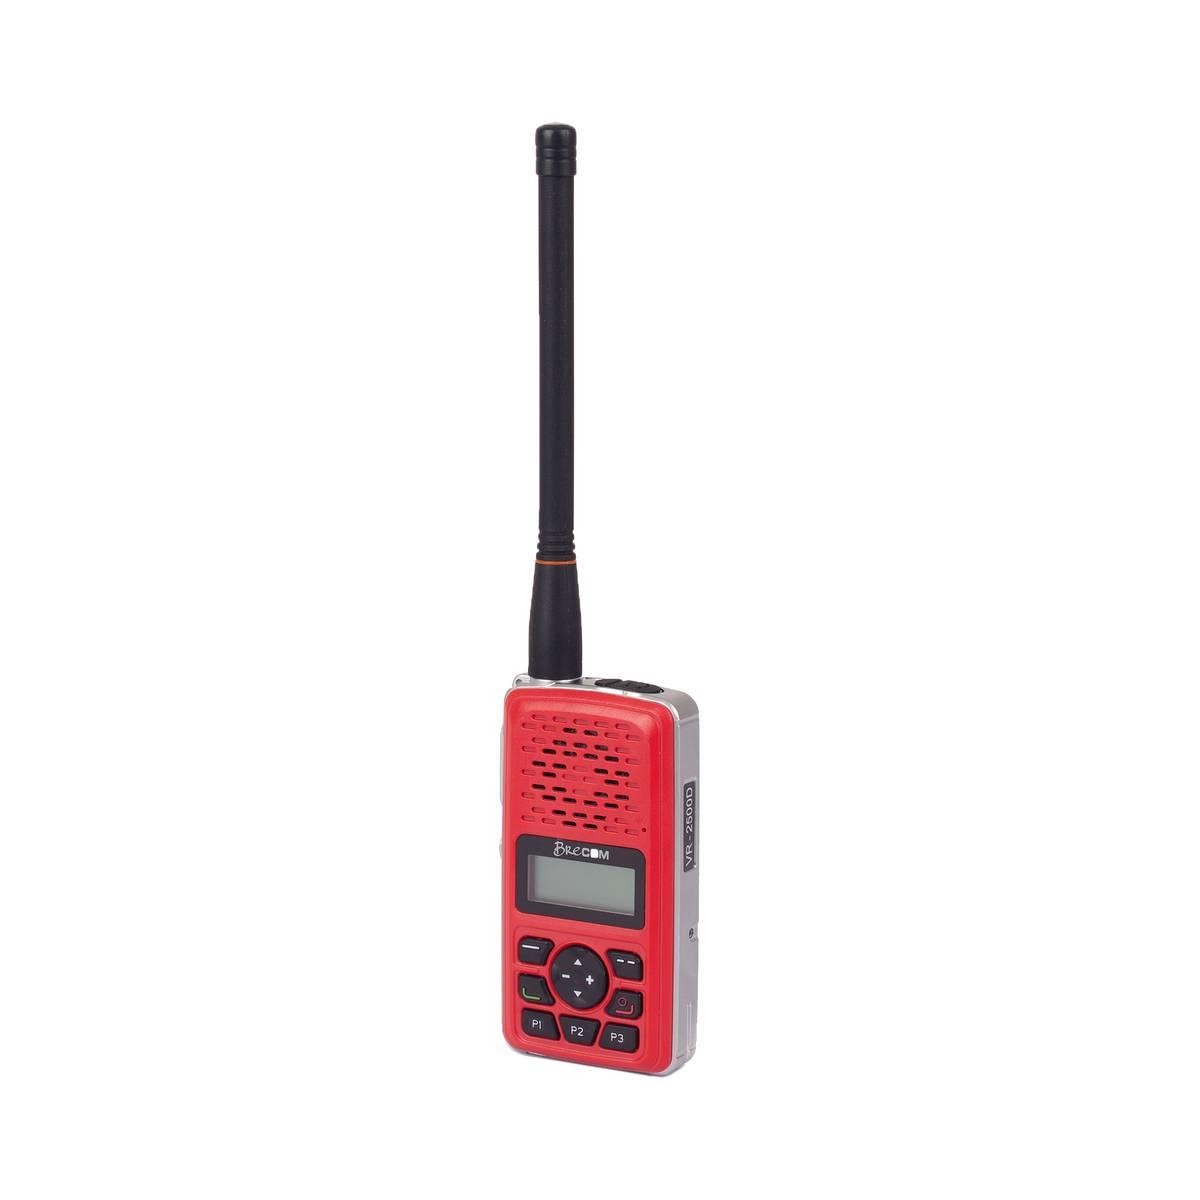 10002500- -Brecom VR-2500 analog/digital radio DMR 138-174Mhz